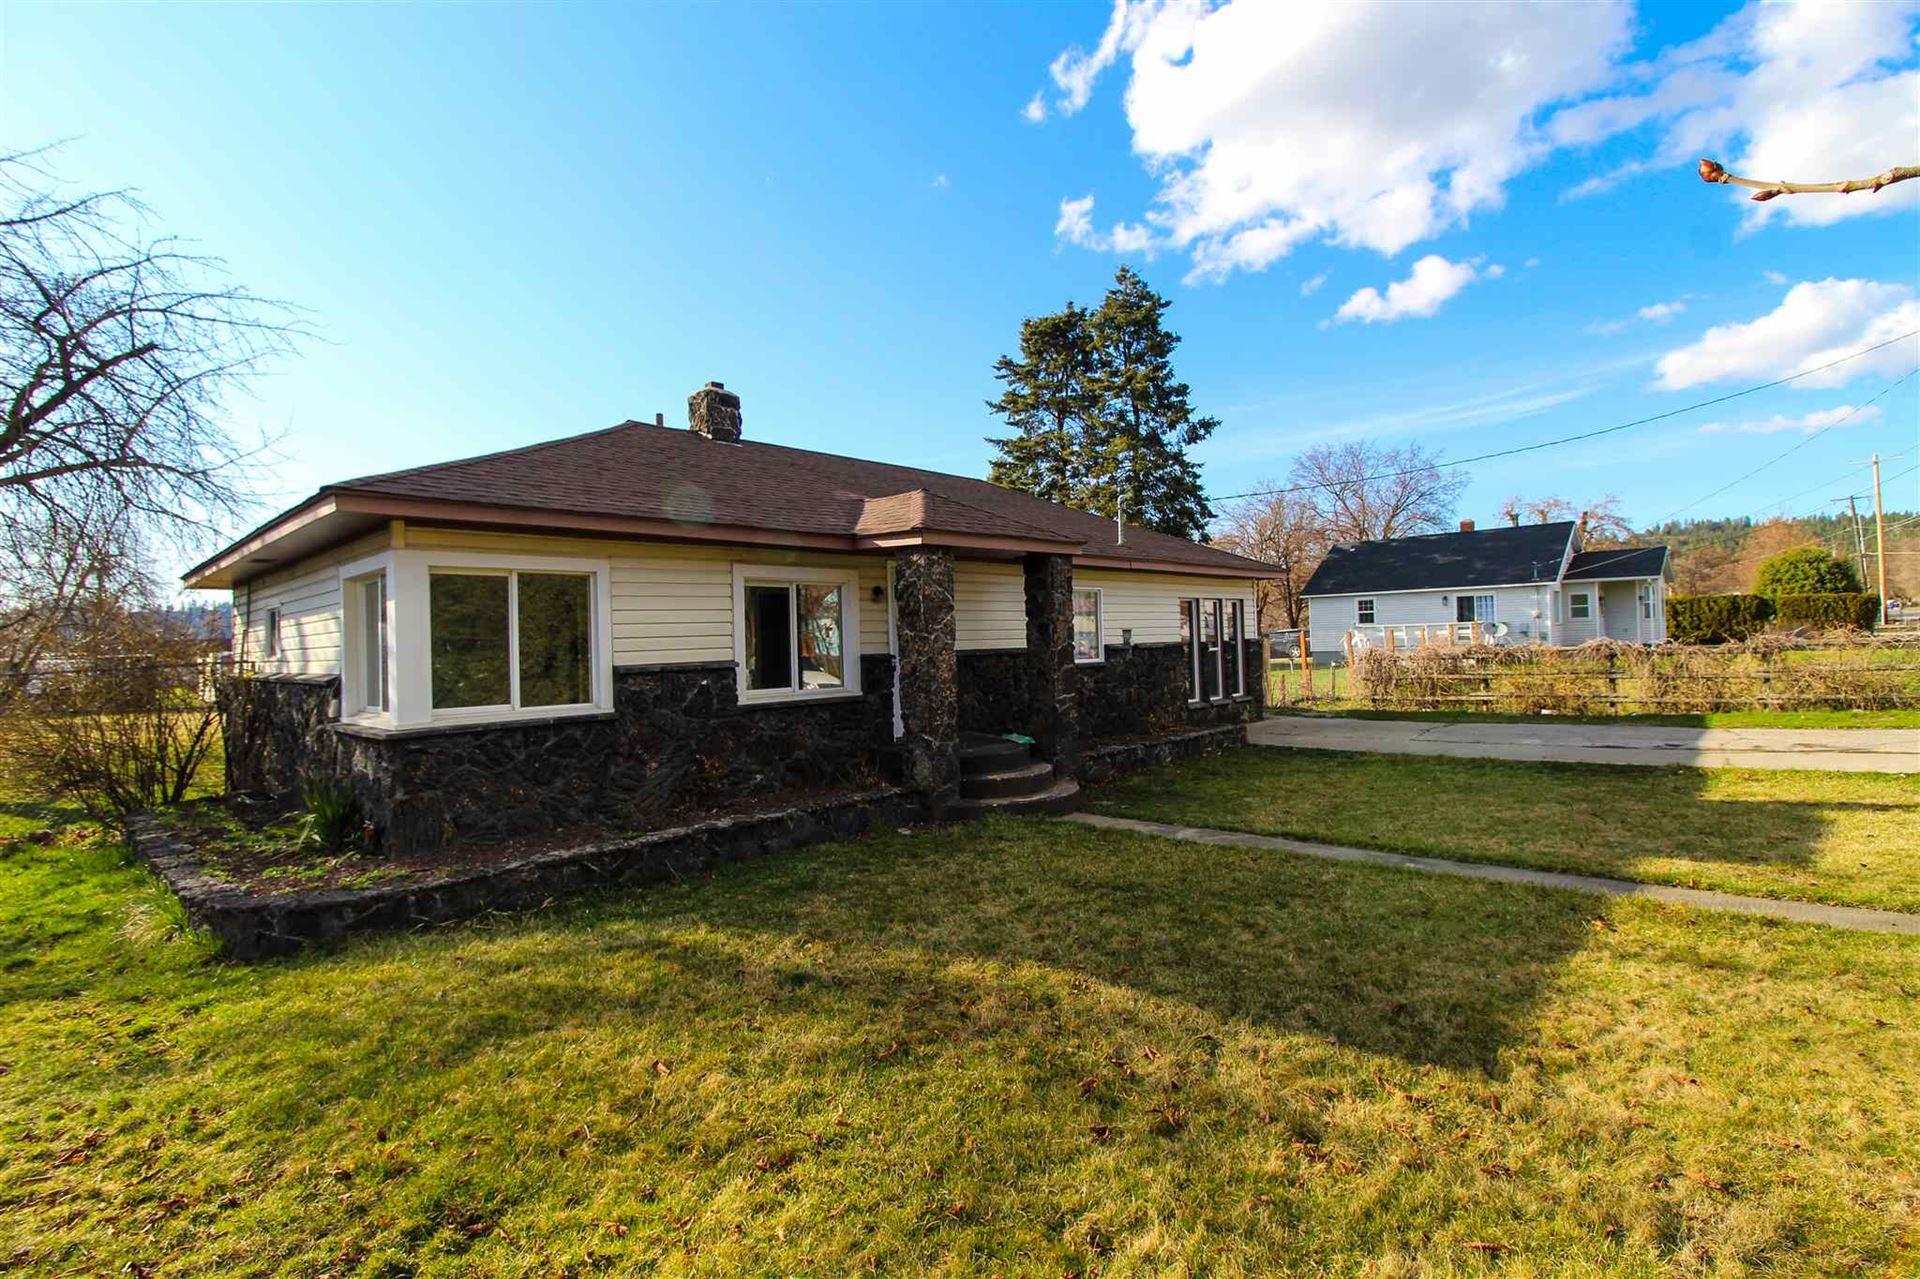 4409 N Evergreen Rd, Spokane Valley, WA 99216 - #: 202111392